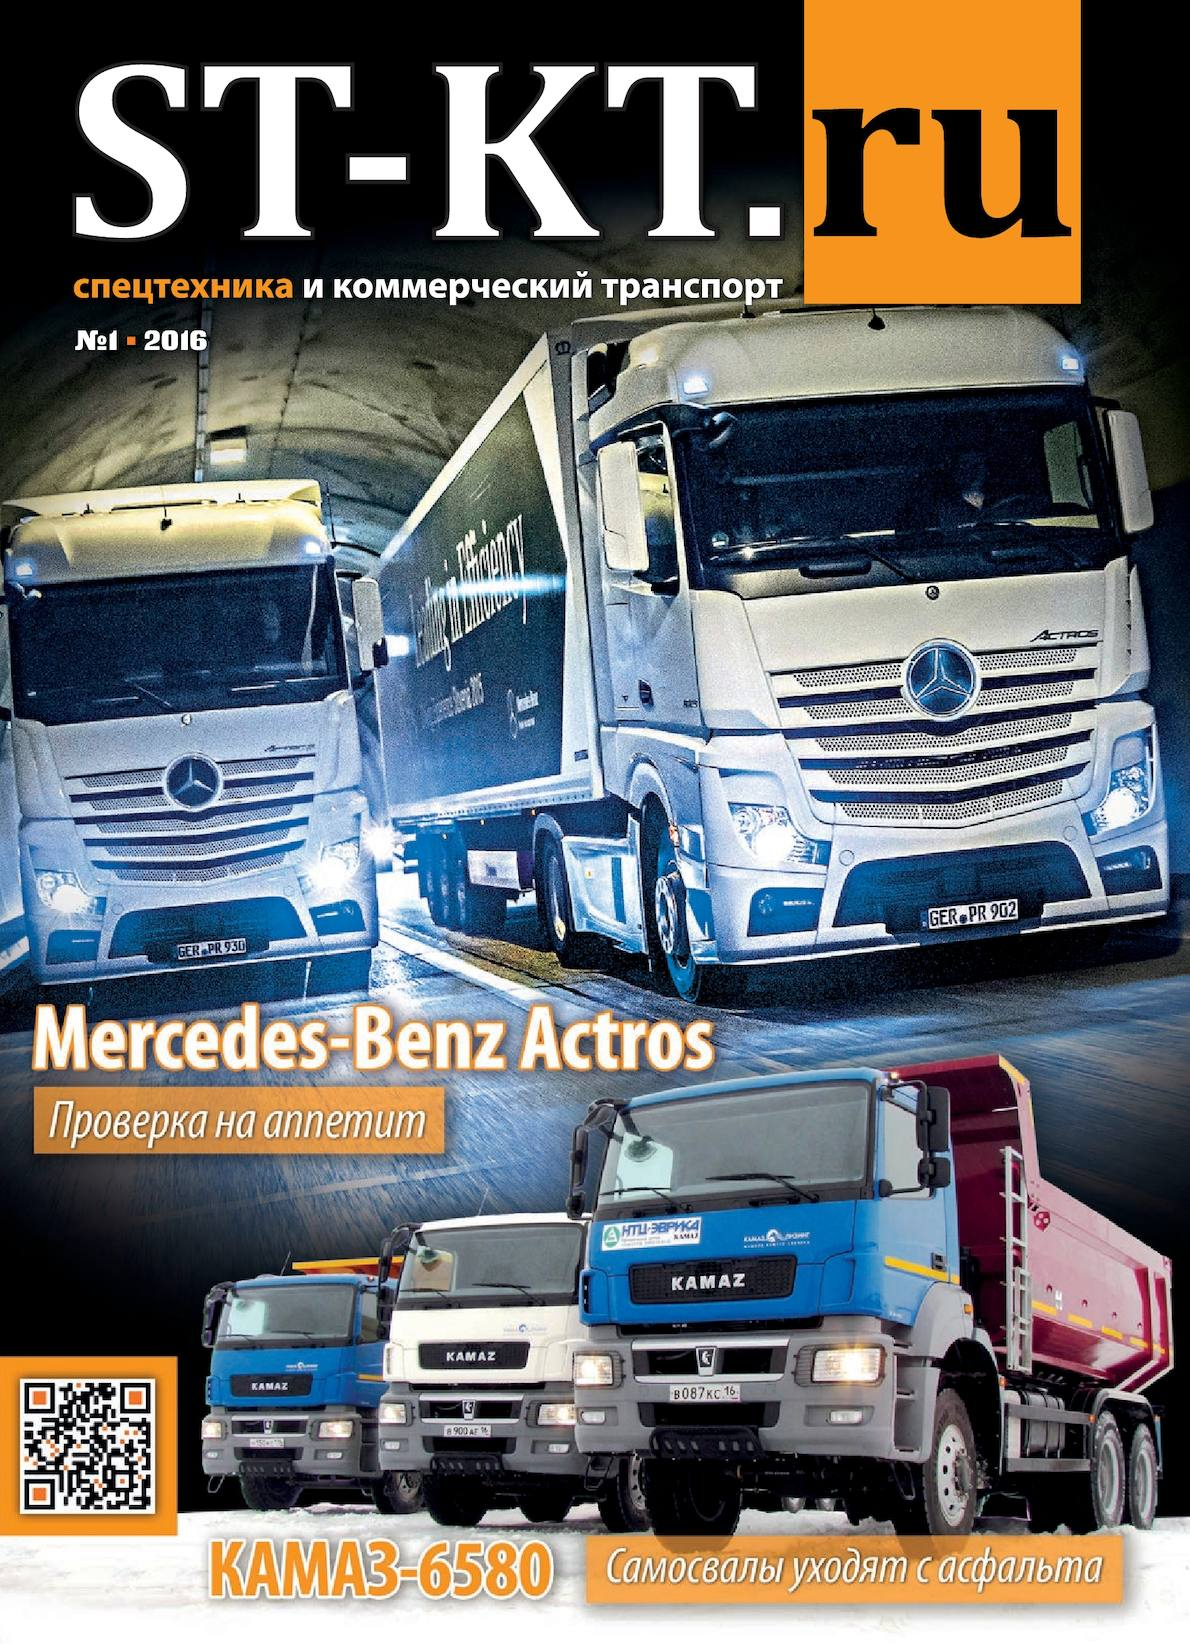 СпецТехника и Коммерческий Транспорт №1/2016